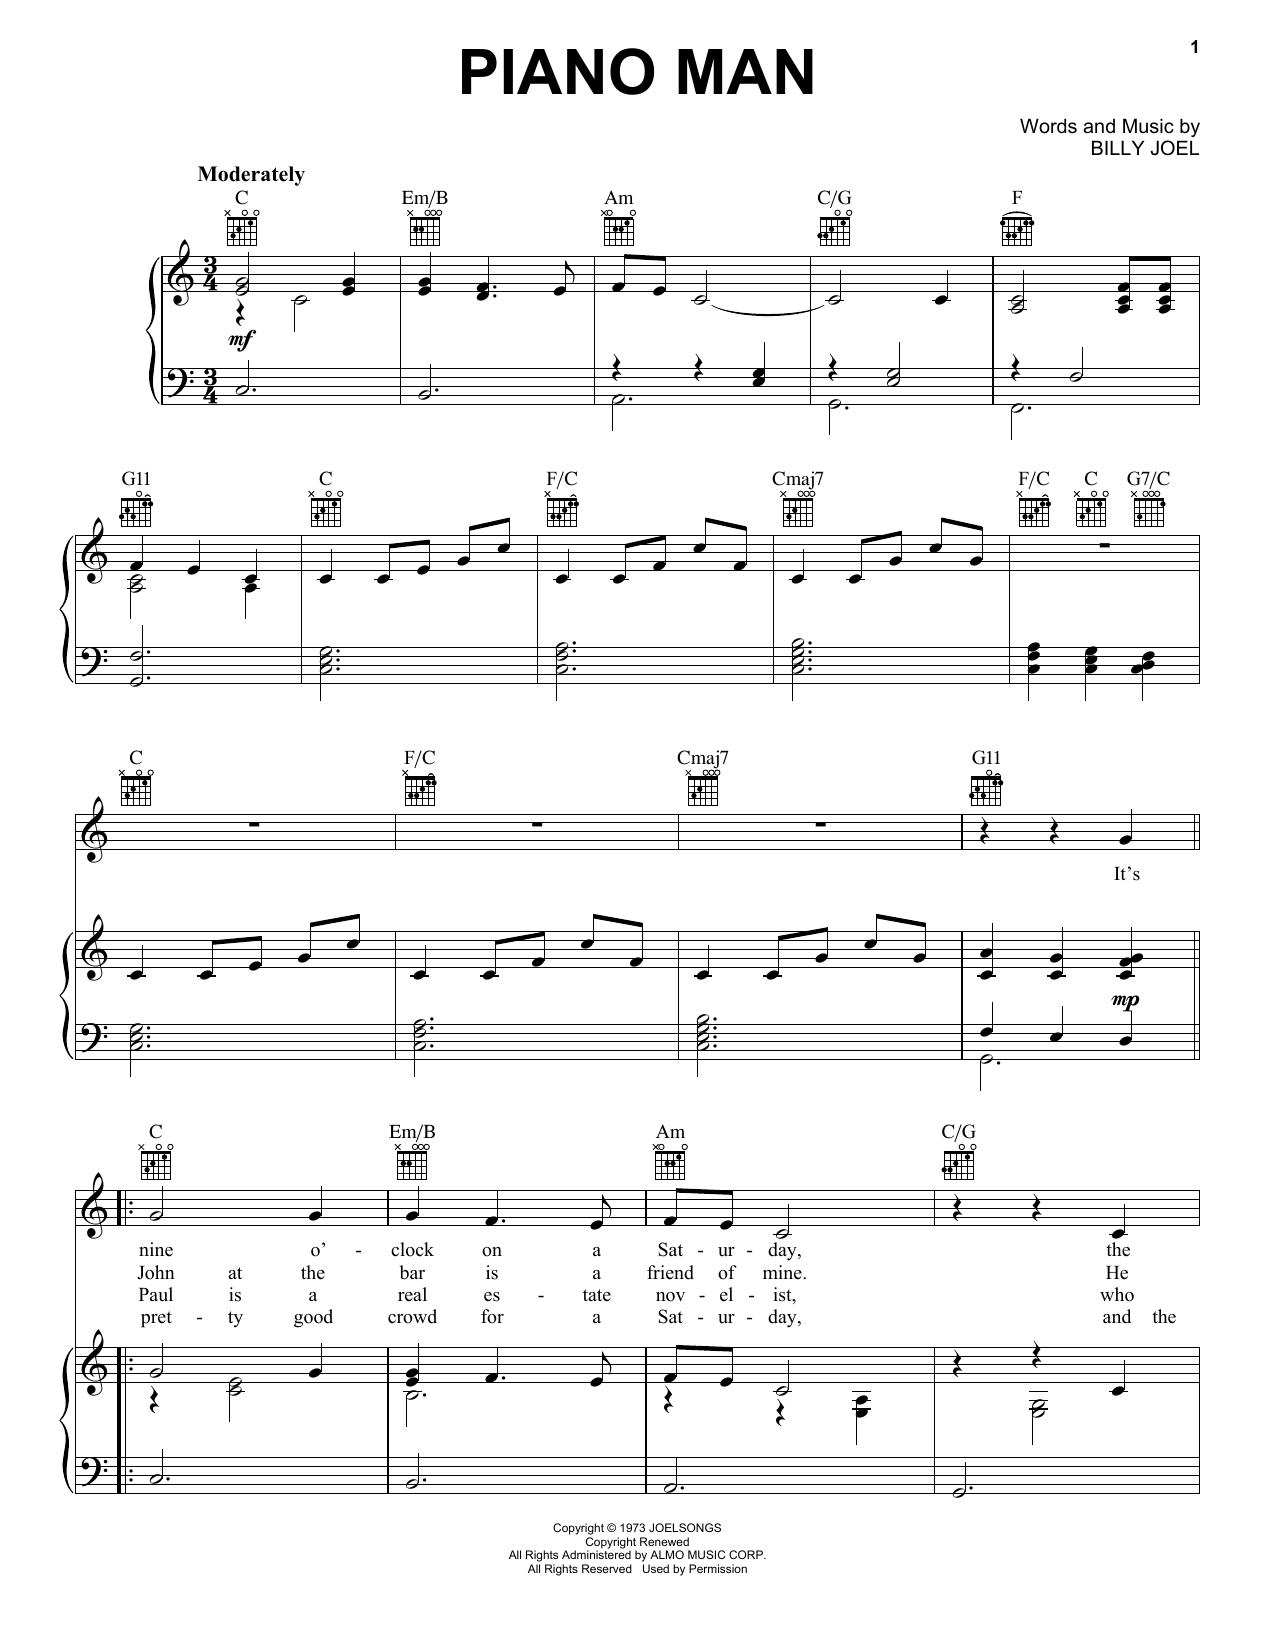 Billy Joel Piano Man sheet music notes and chords. Download Printable PDF.